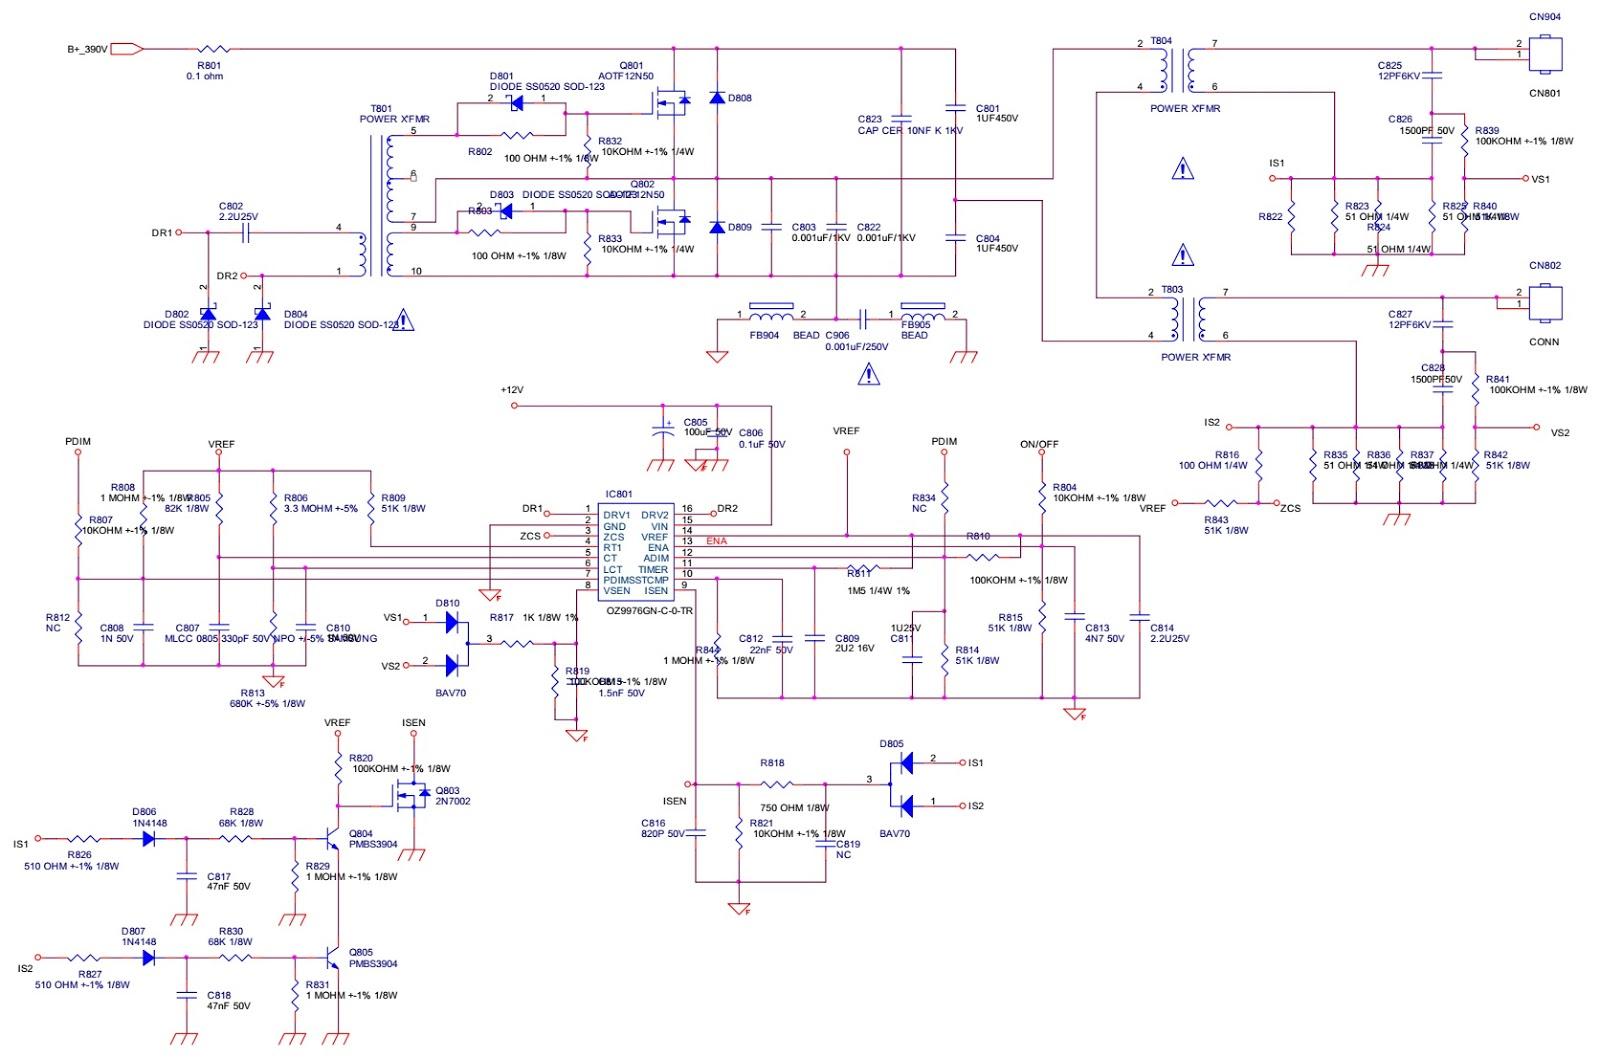 715g3829p02 Lcd Tv Power Supply Circuit Diagram Insignia Ns Jacobsladderhvsupply Powersupplycircuit Back Light Inverter